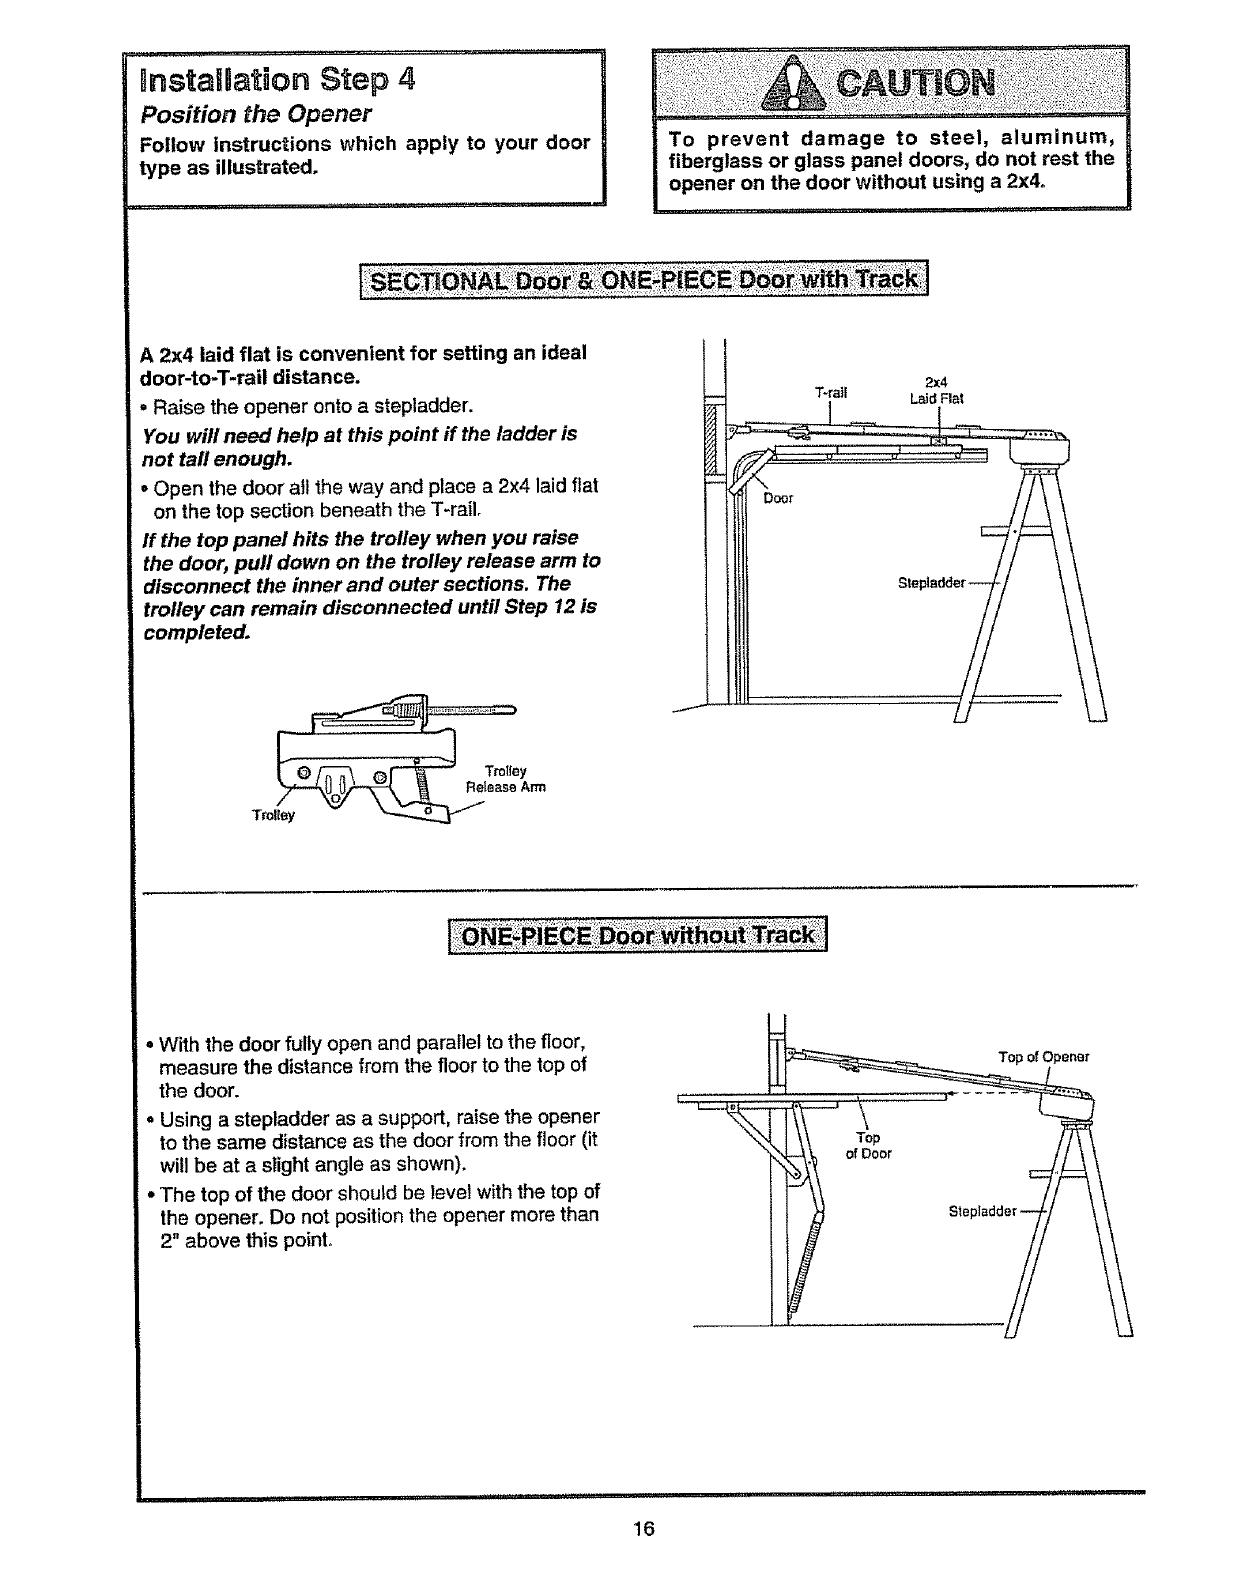 Craftsman 13953800srt User Manual 1 2 Hp Garage Door Opener Manuals Helical Wire Harness Lay Nstaubation Step 4